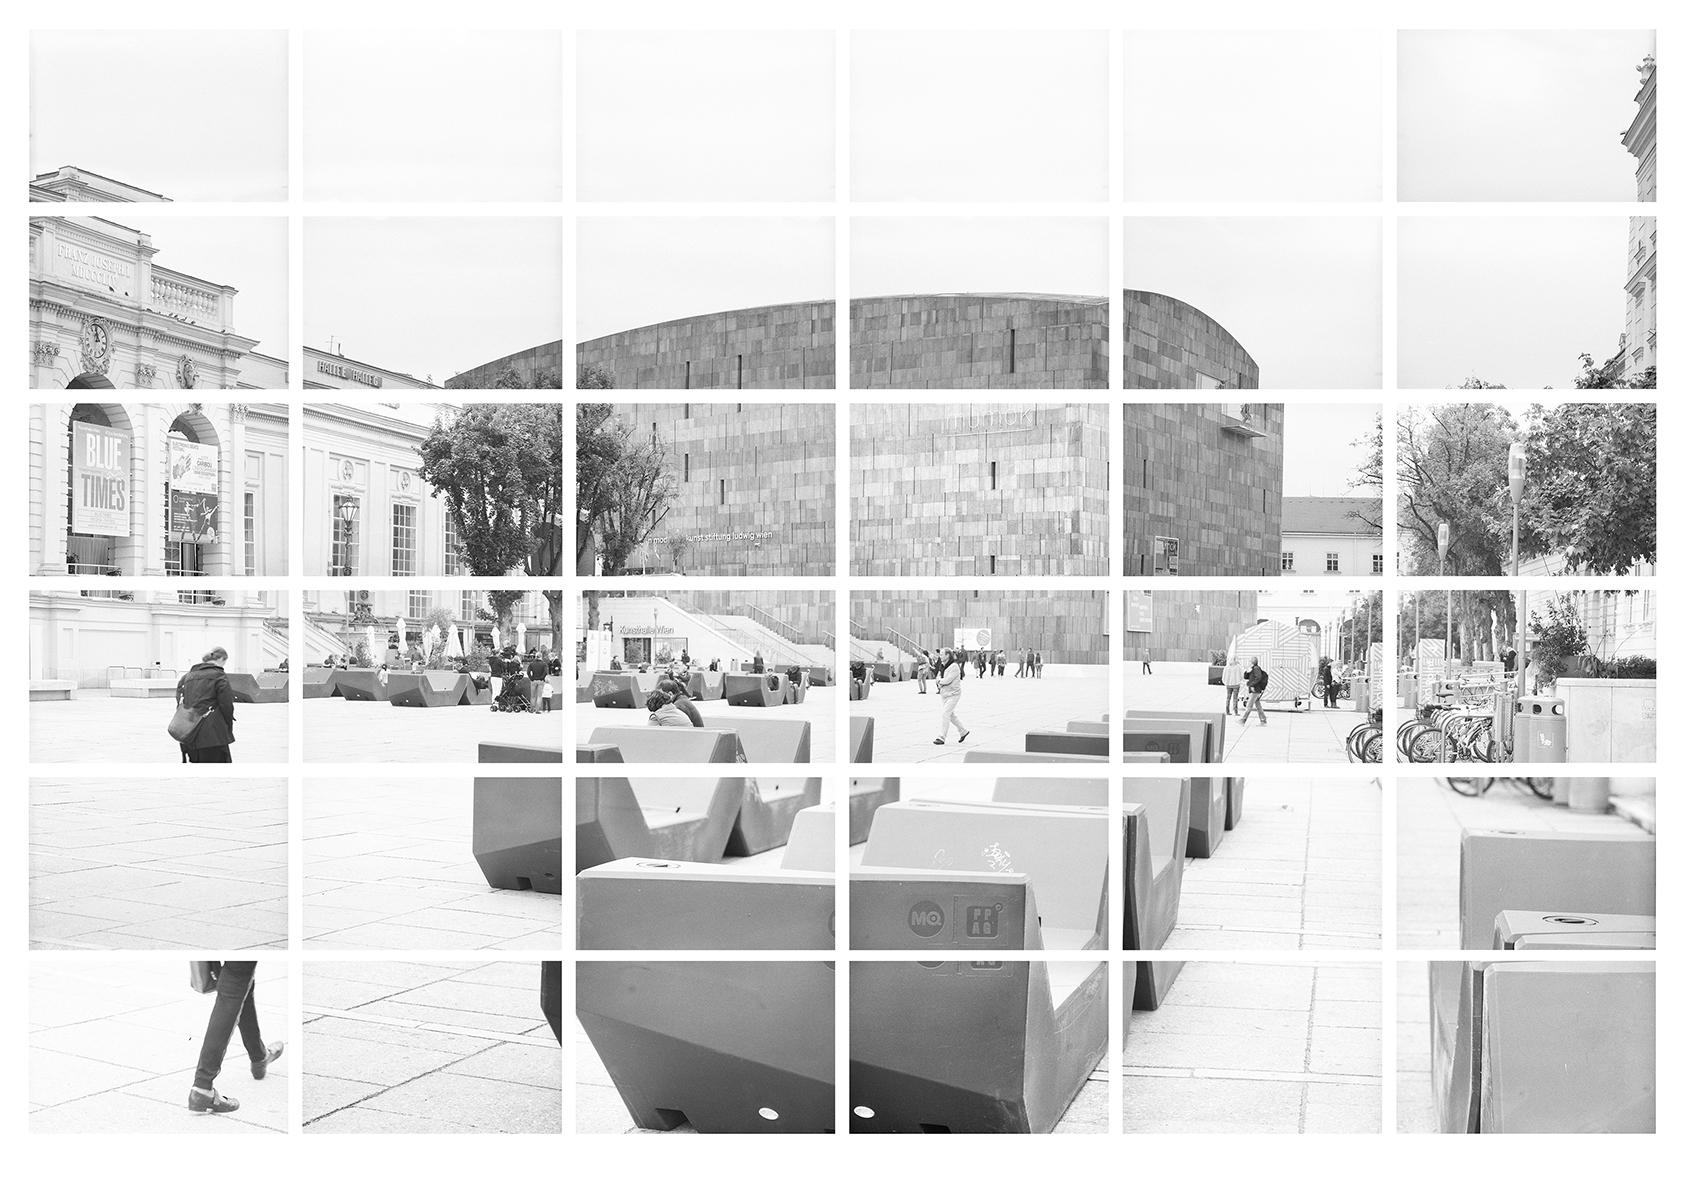 Foto: (c) Zoltan Adorjani // 1 Film 1 Bild -Museumsquartier Wien